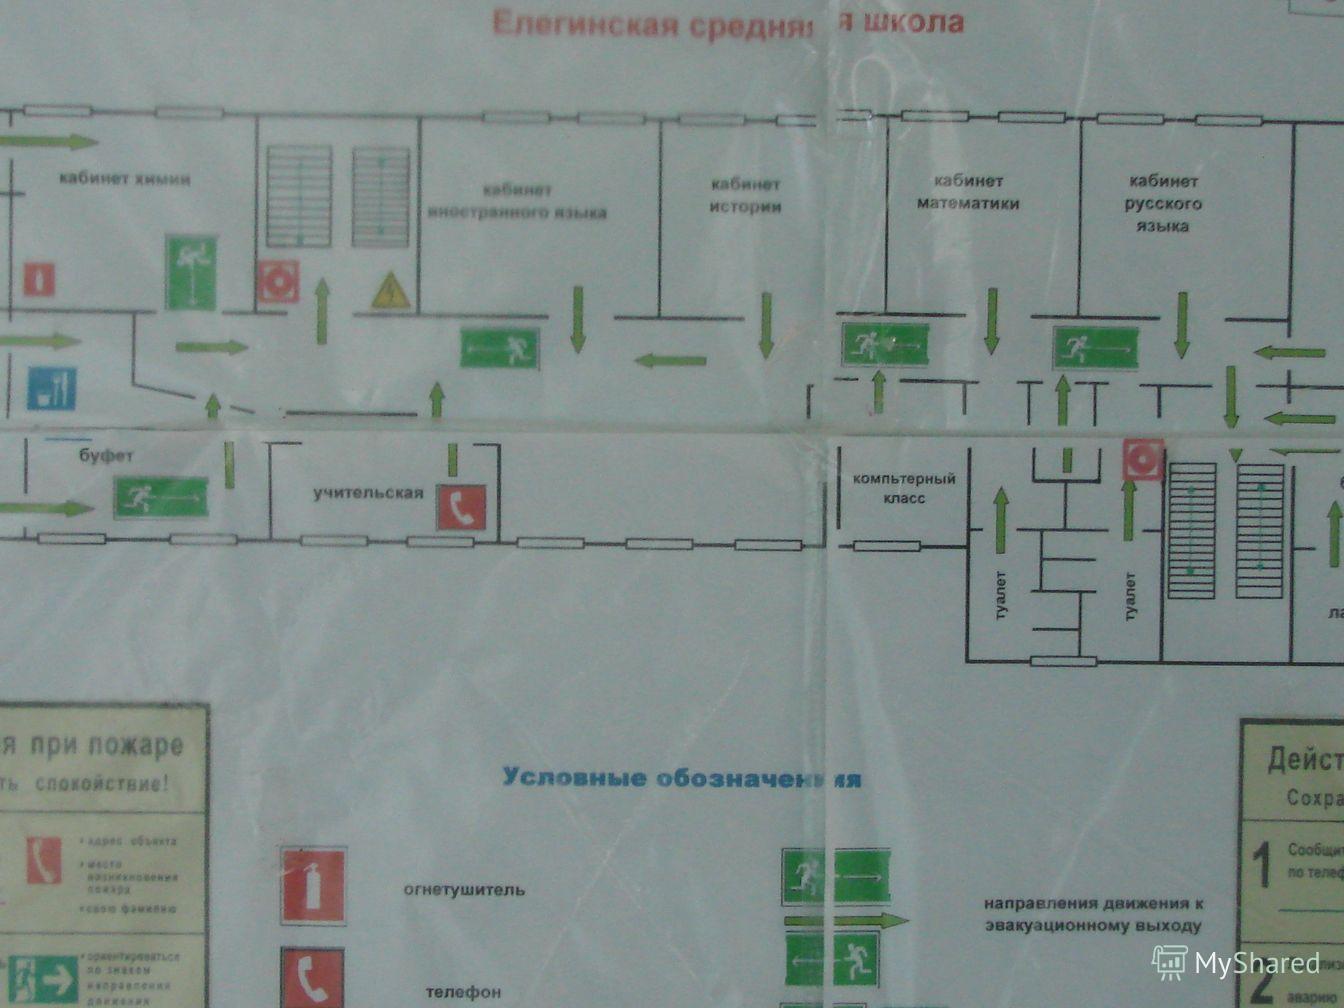 ПАСПОРТ ОБЪЕКТА ОБРАЗОВАНИЯ МОУ«Елегинская СОШ» д Елегино ул. Задняя,11 (план 2-го этажа) ПАСПОРТ ОБЪЕКТА ОБРАЗОВАНИЯ МОУ«Елегинская СОШ» д Елегино ул. Задняя,11 (план 2-го этажа)